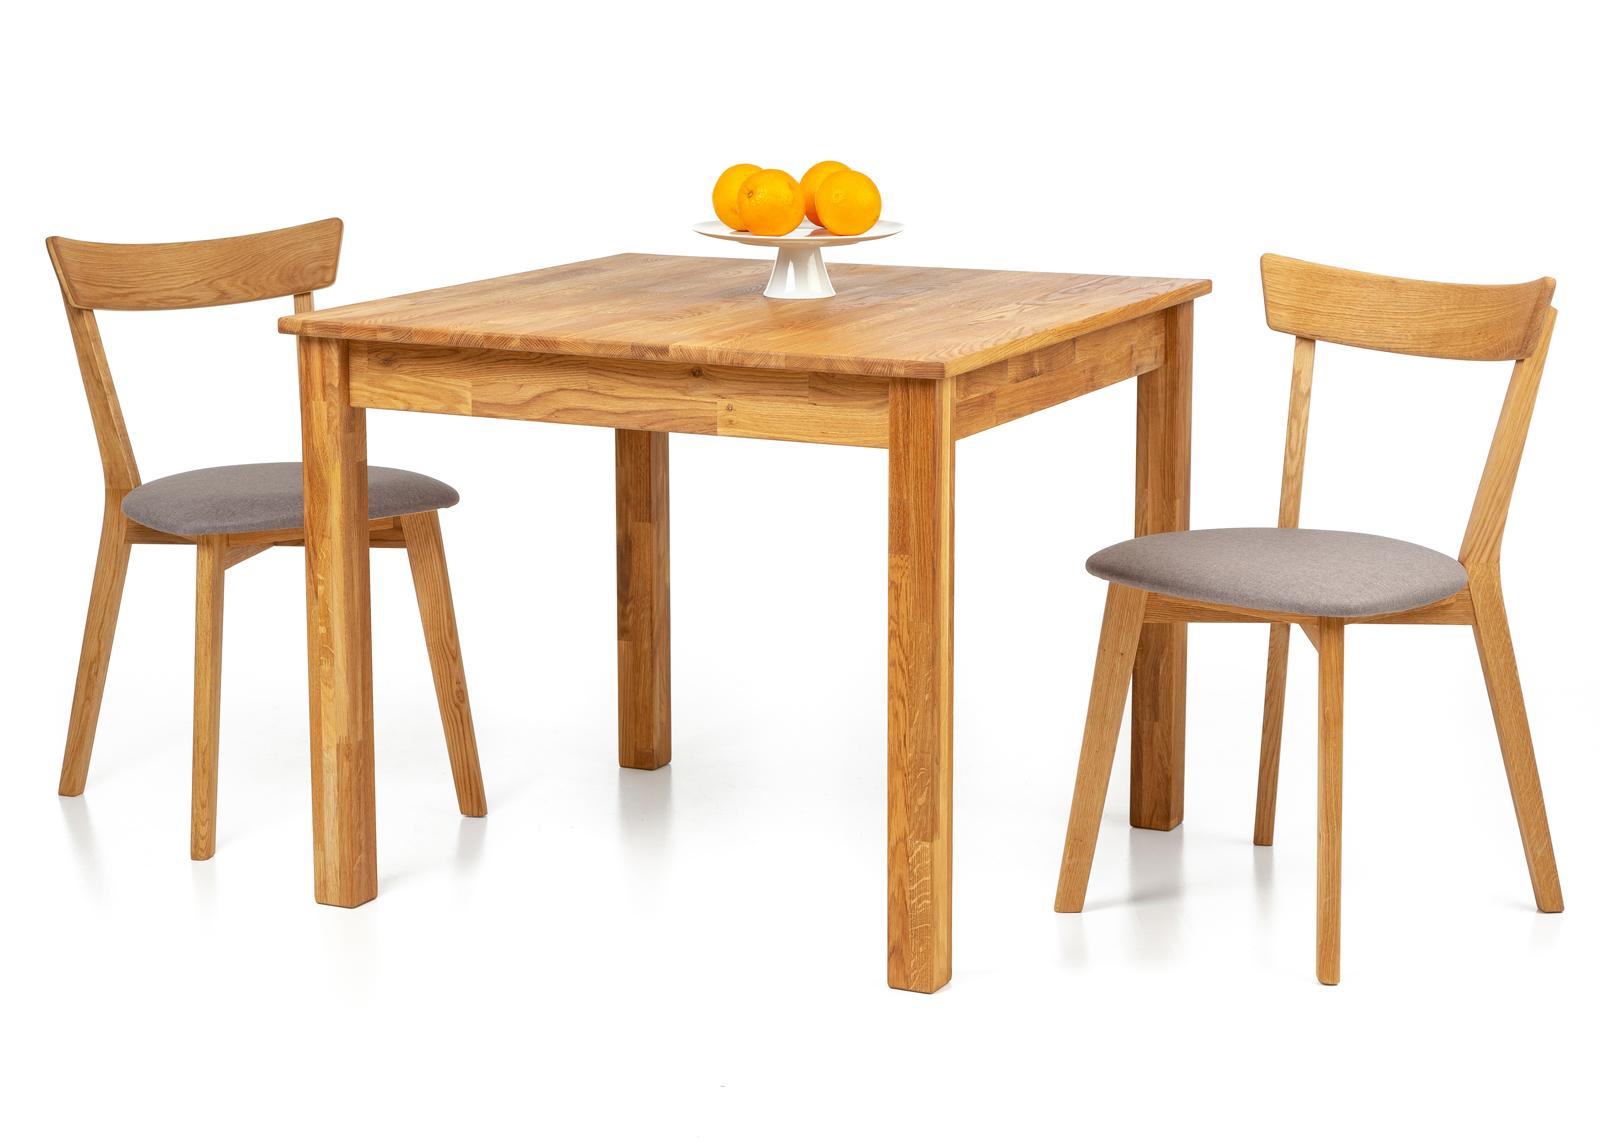 Tammi ruokapöytä Lem 90x90 cm + 4 tuolia Viola harmaa